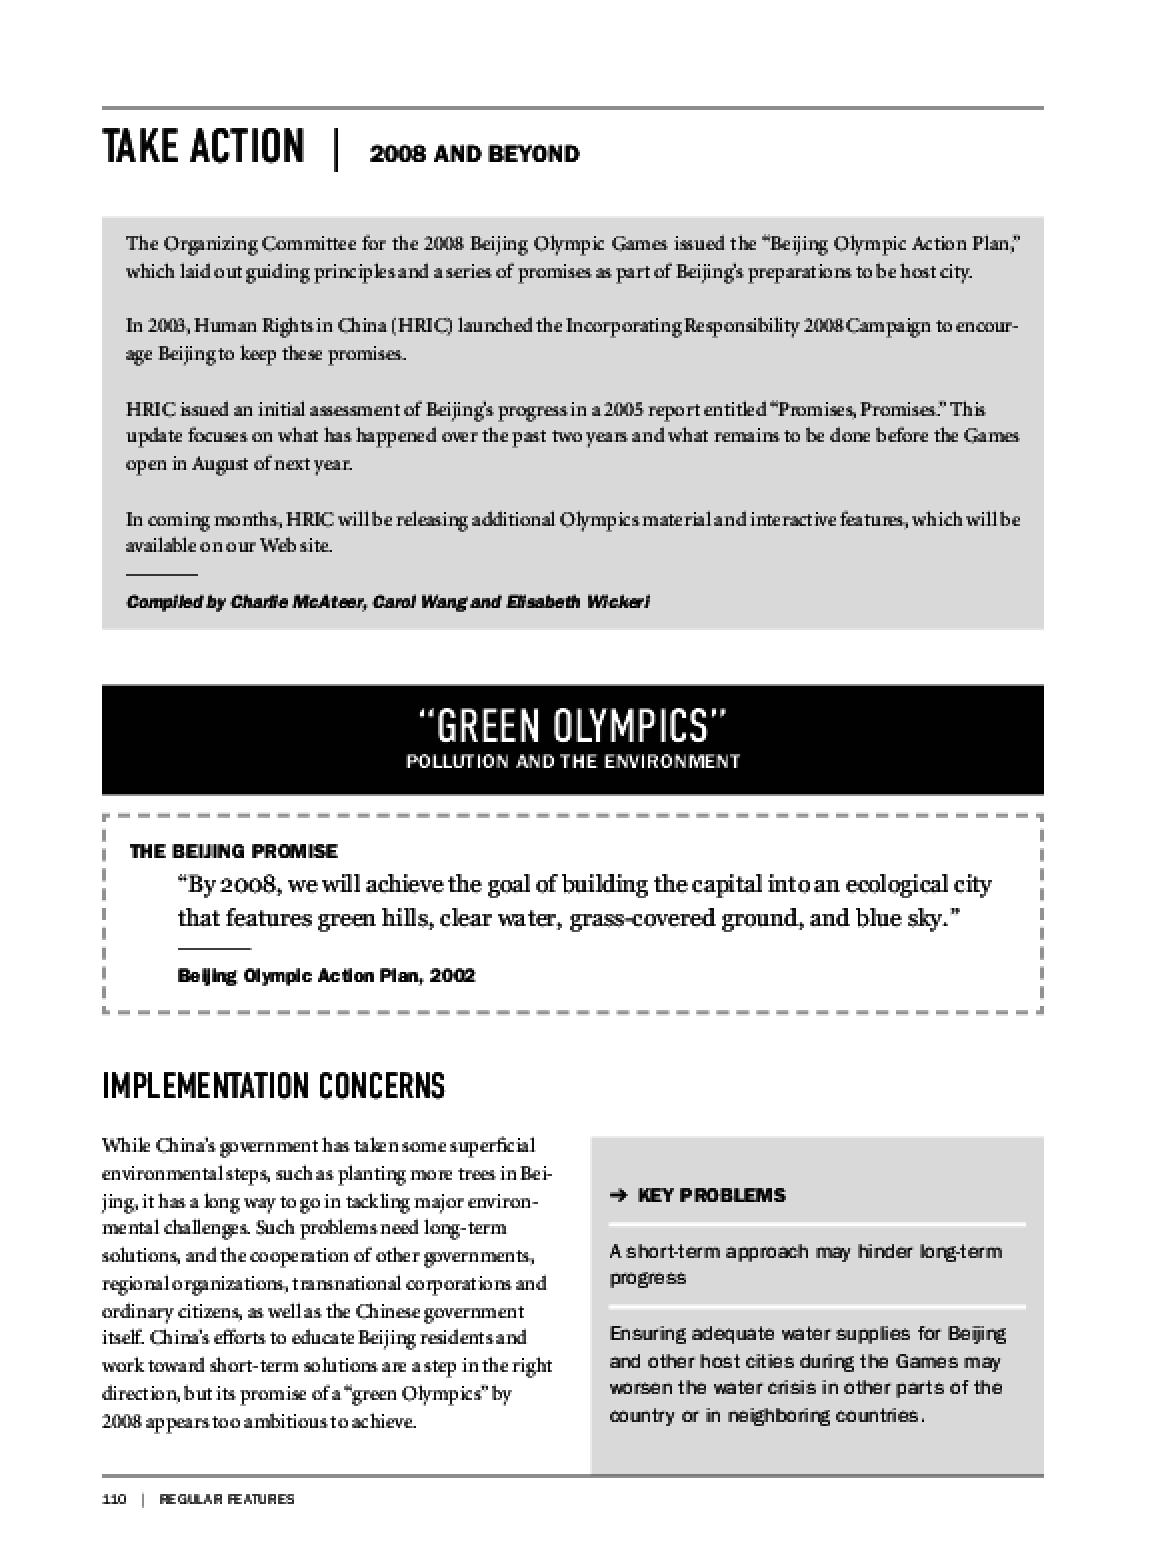 Take Action: 2008 and Beyond